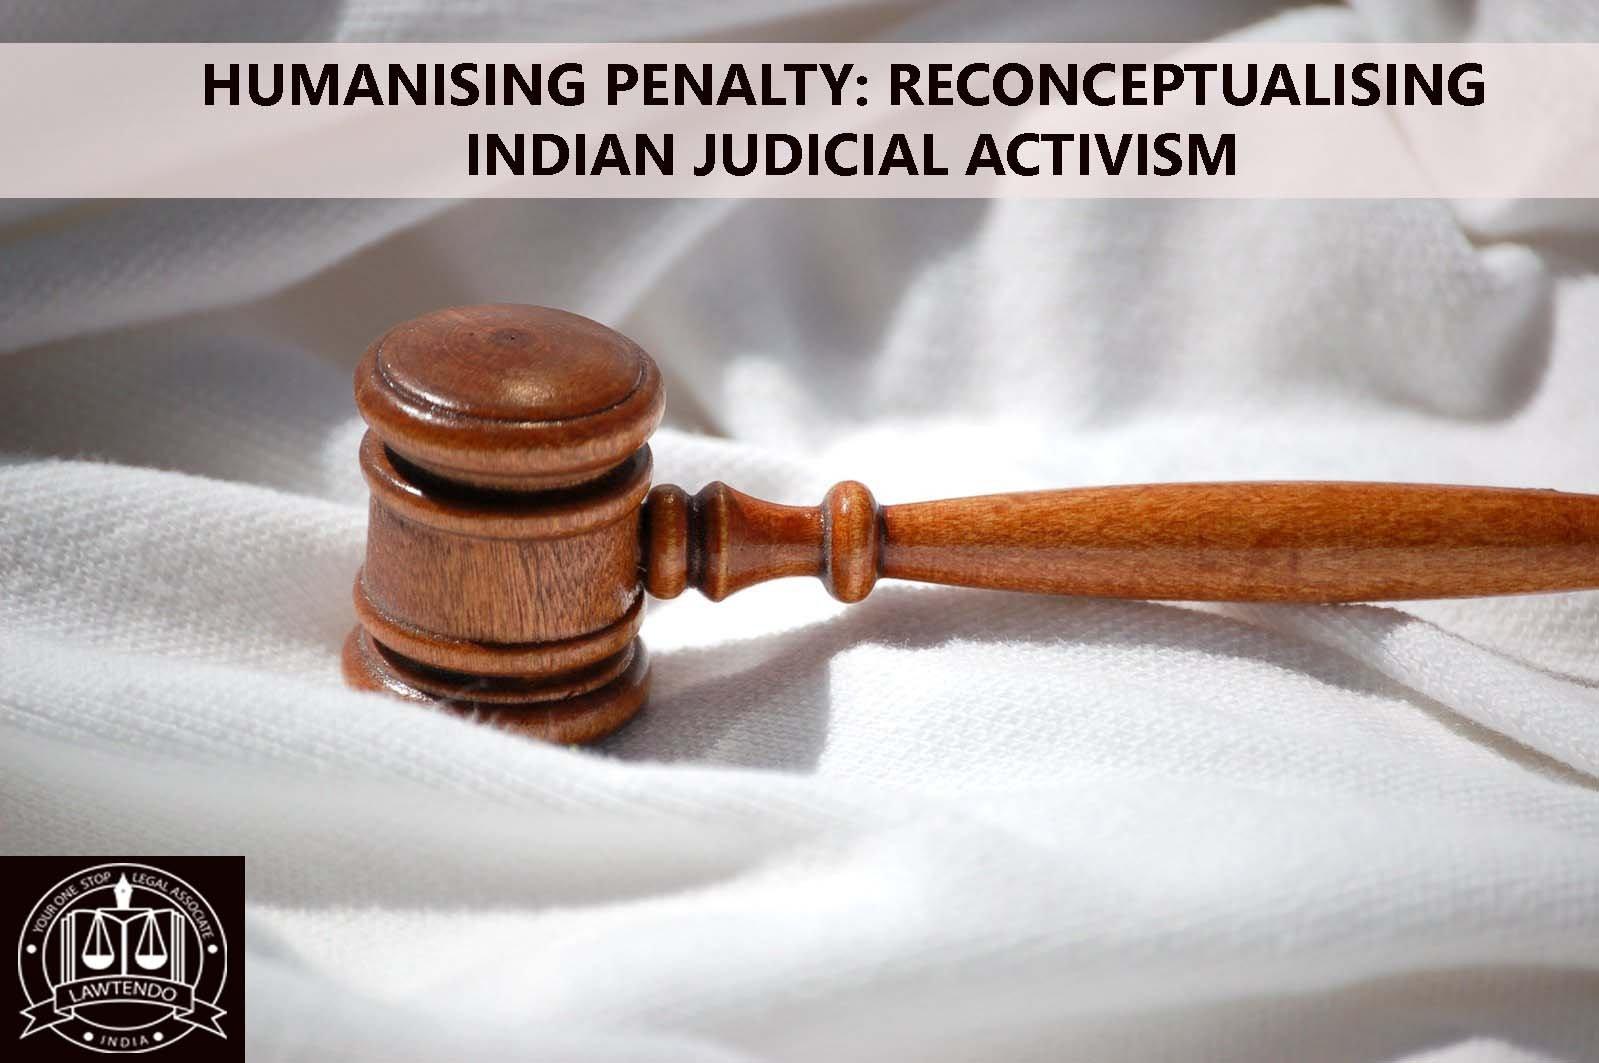 HUMANISING PENALTY: RECONCEPTUALISING INDIAN JUDICIAL ACTIVISM